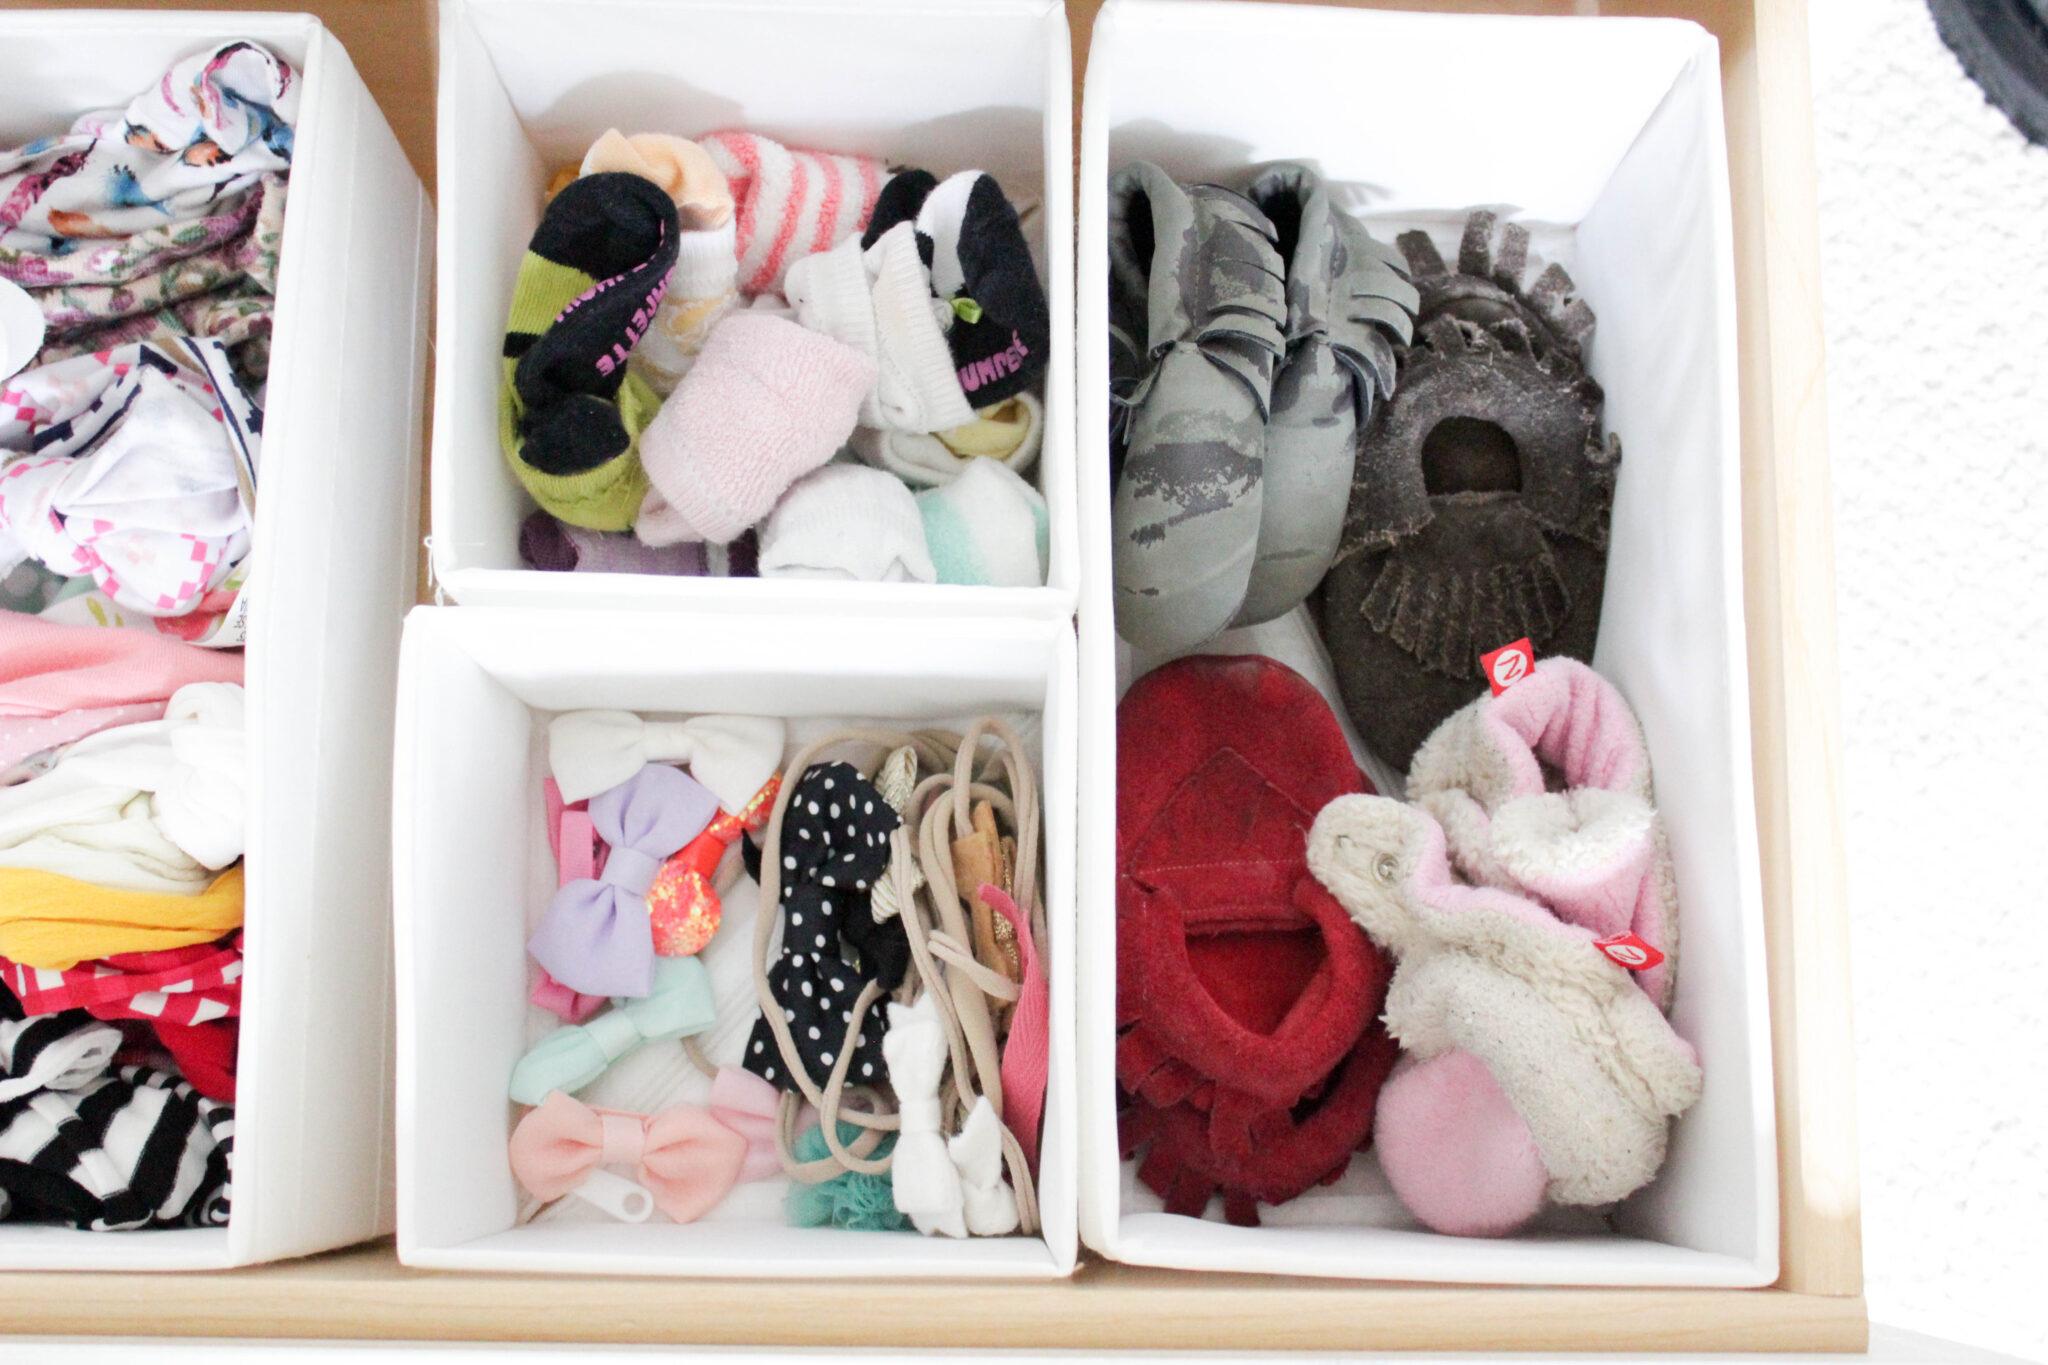 organizing baby's closet - dresser drawers